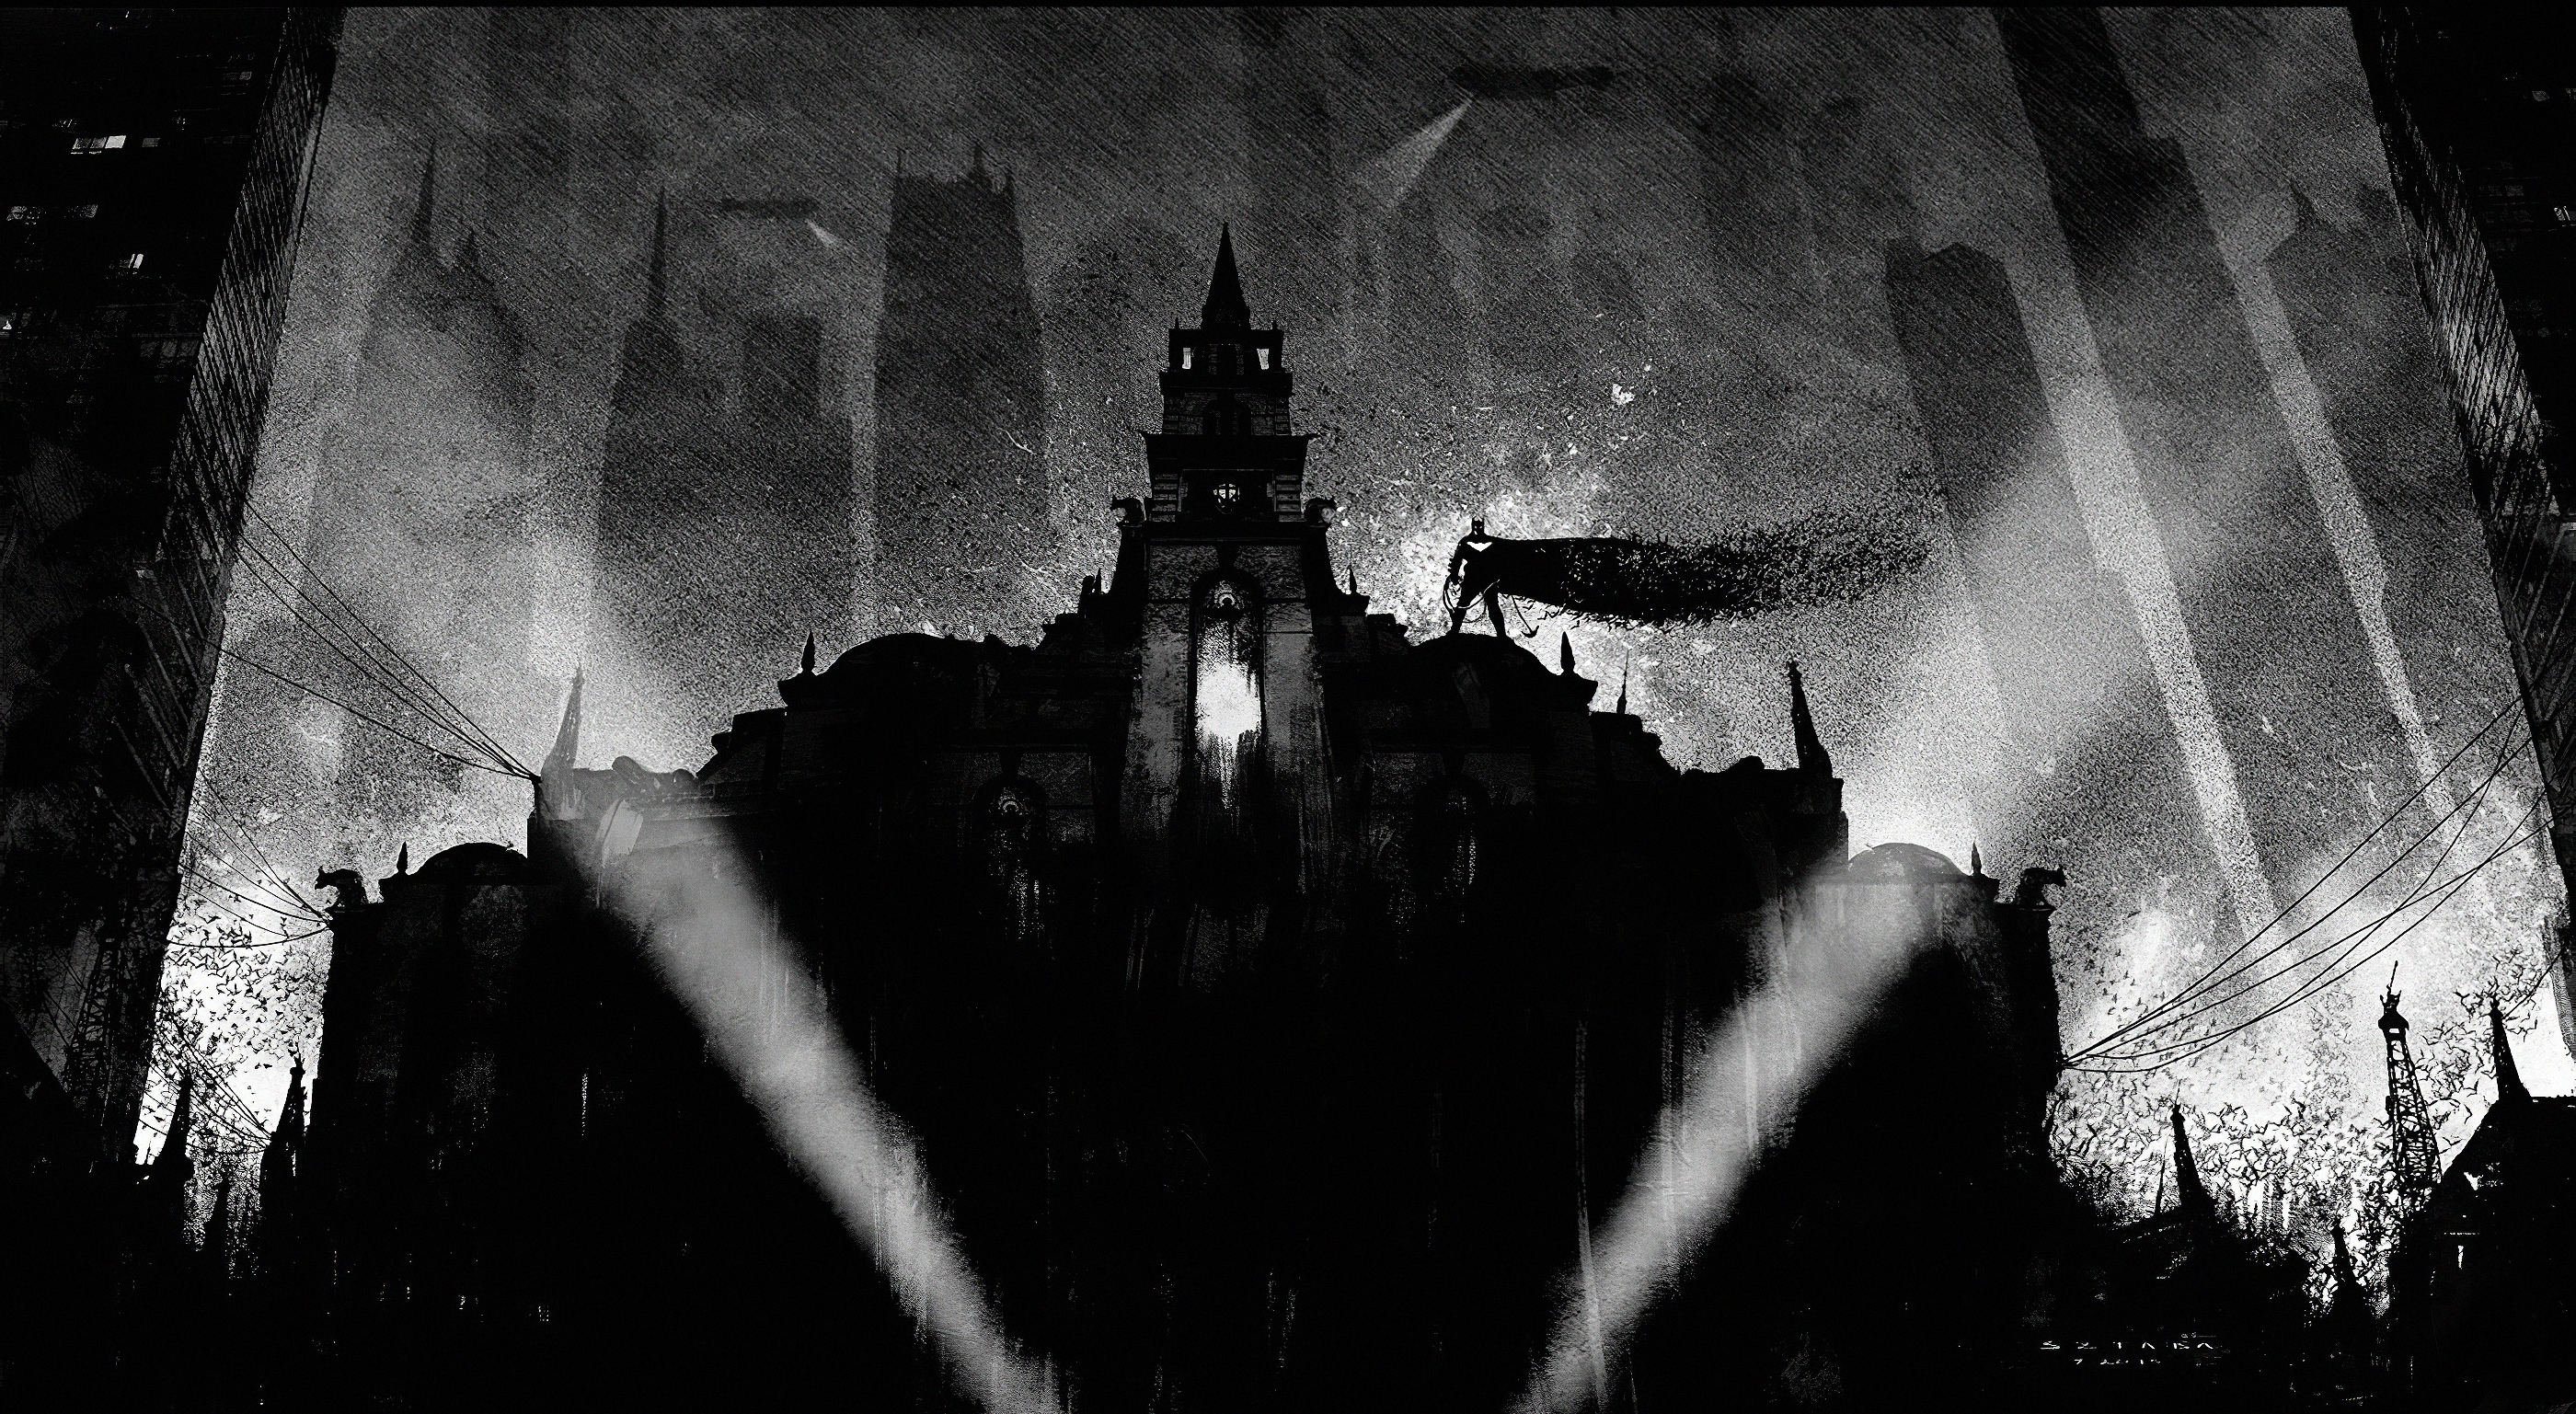 Batman Dark Theme Wallpaper Hd Superheroes 4k Wallpapers